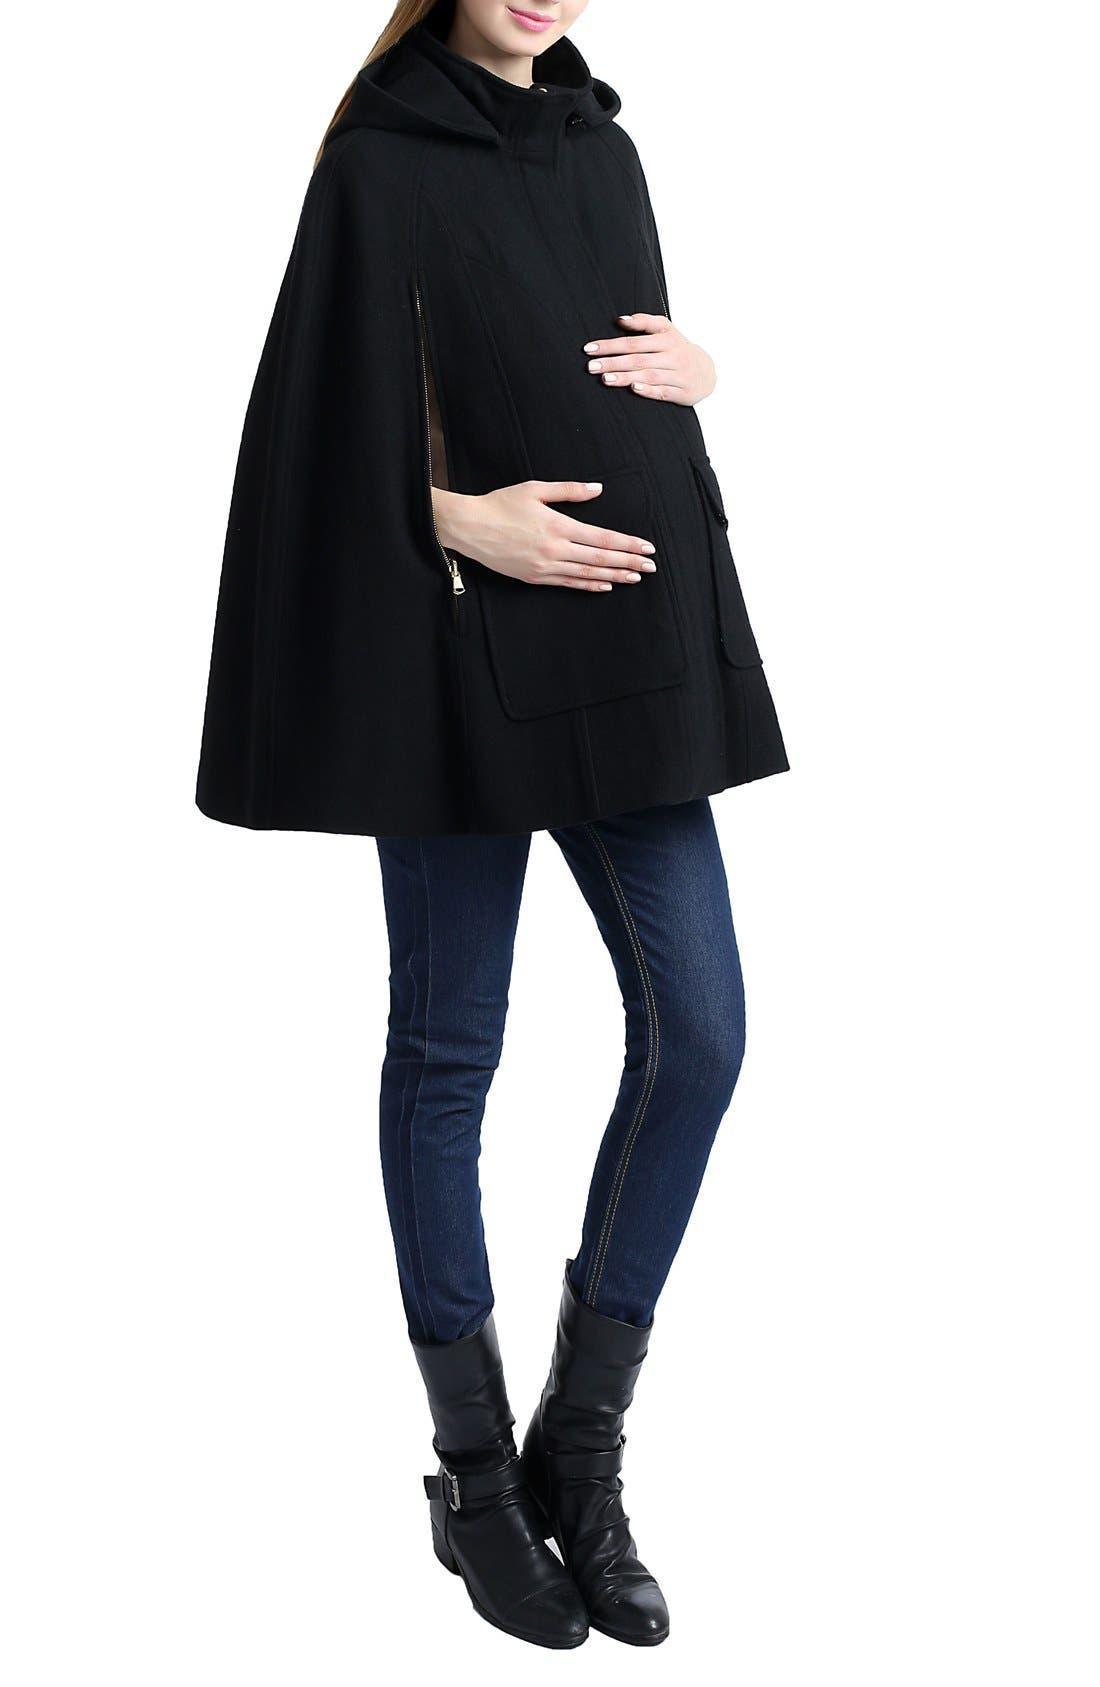 KIMI AND KAI,                             'Robin' Wool Blend Maternity Cape,                             Alternate thumbnail 4, color,                             001